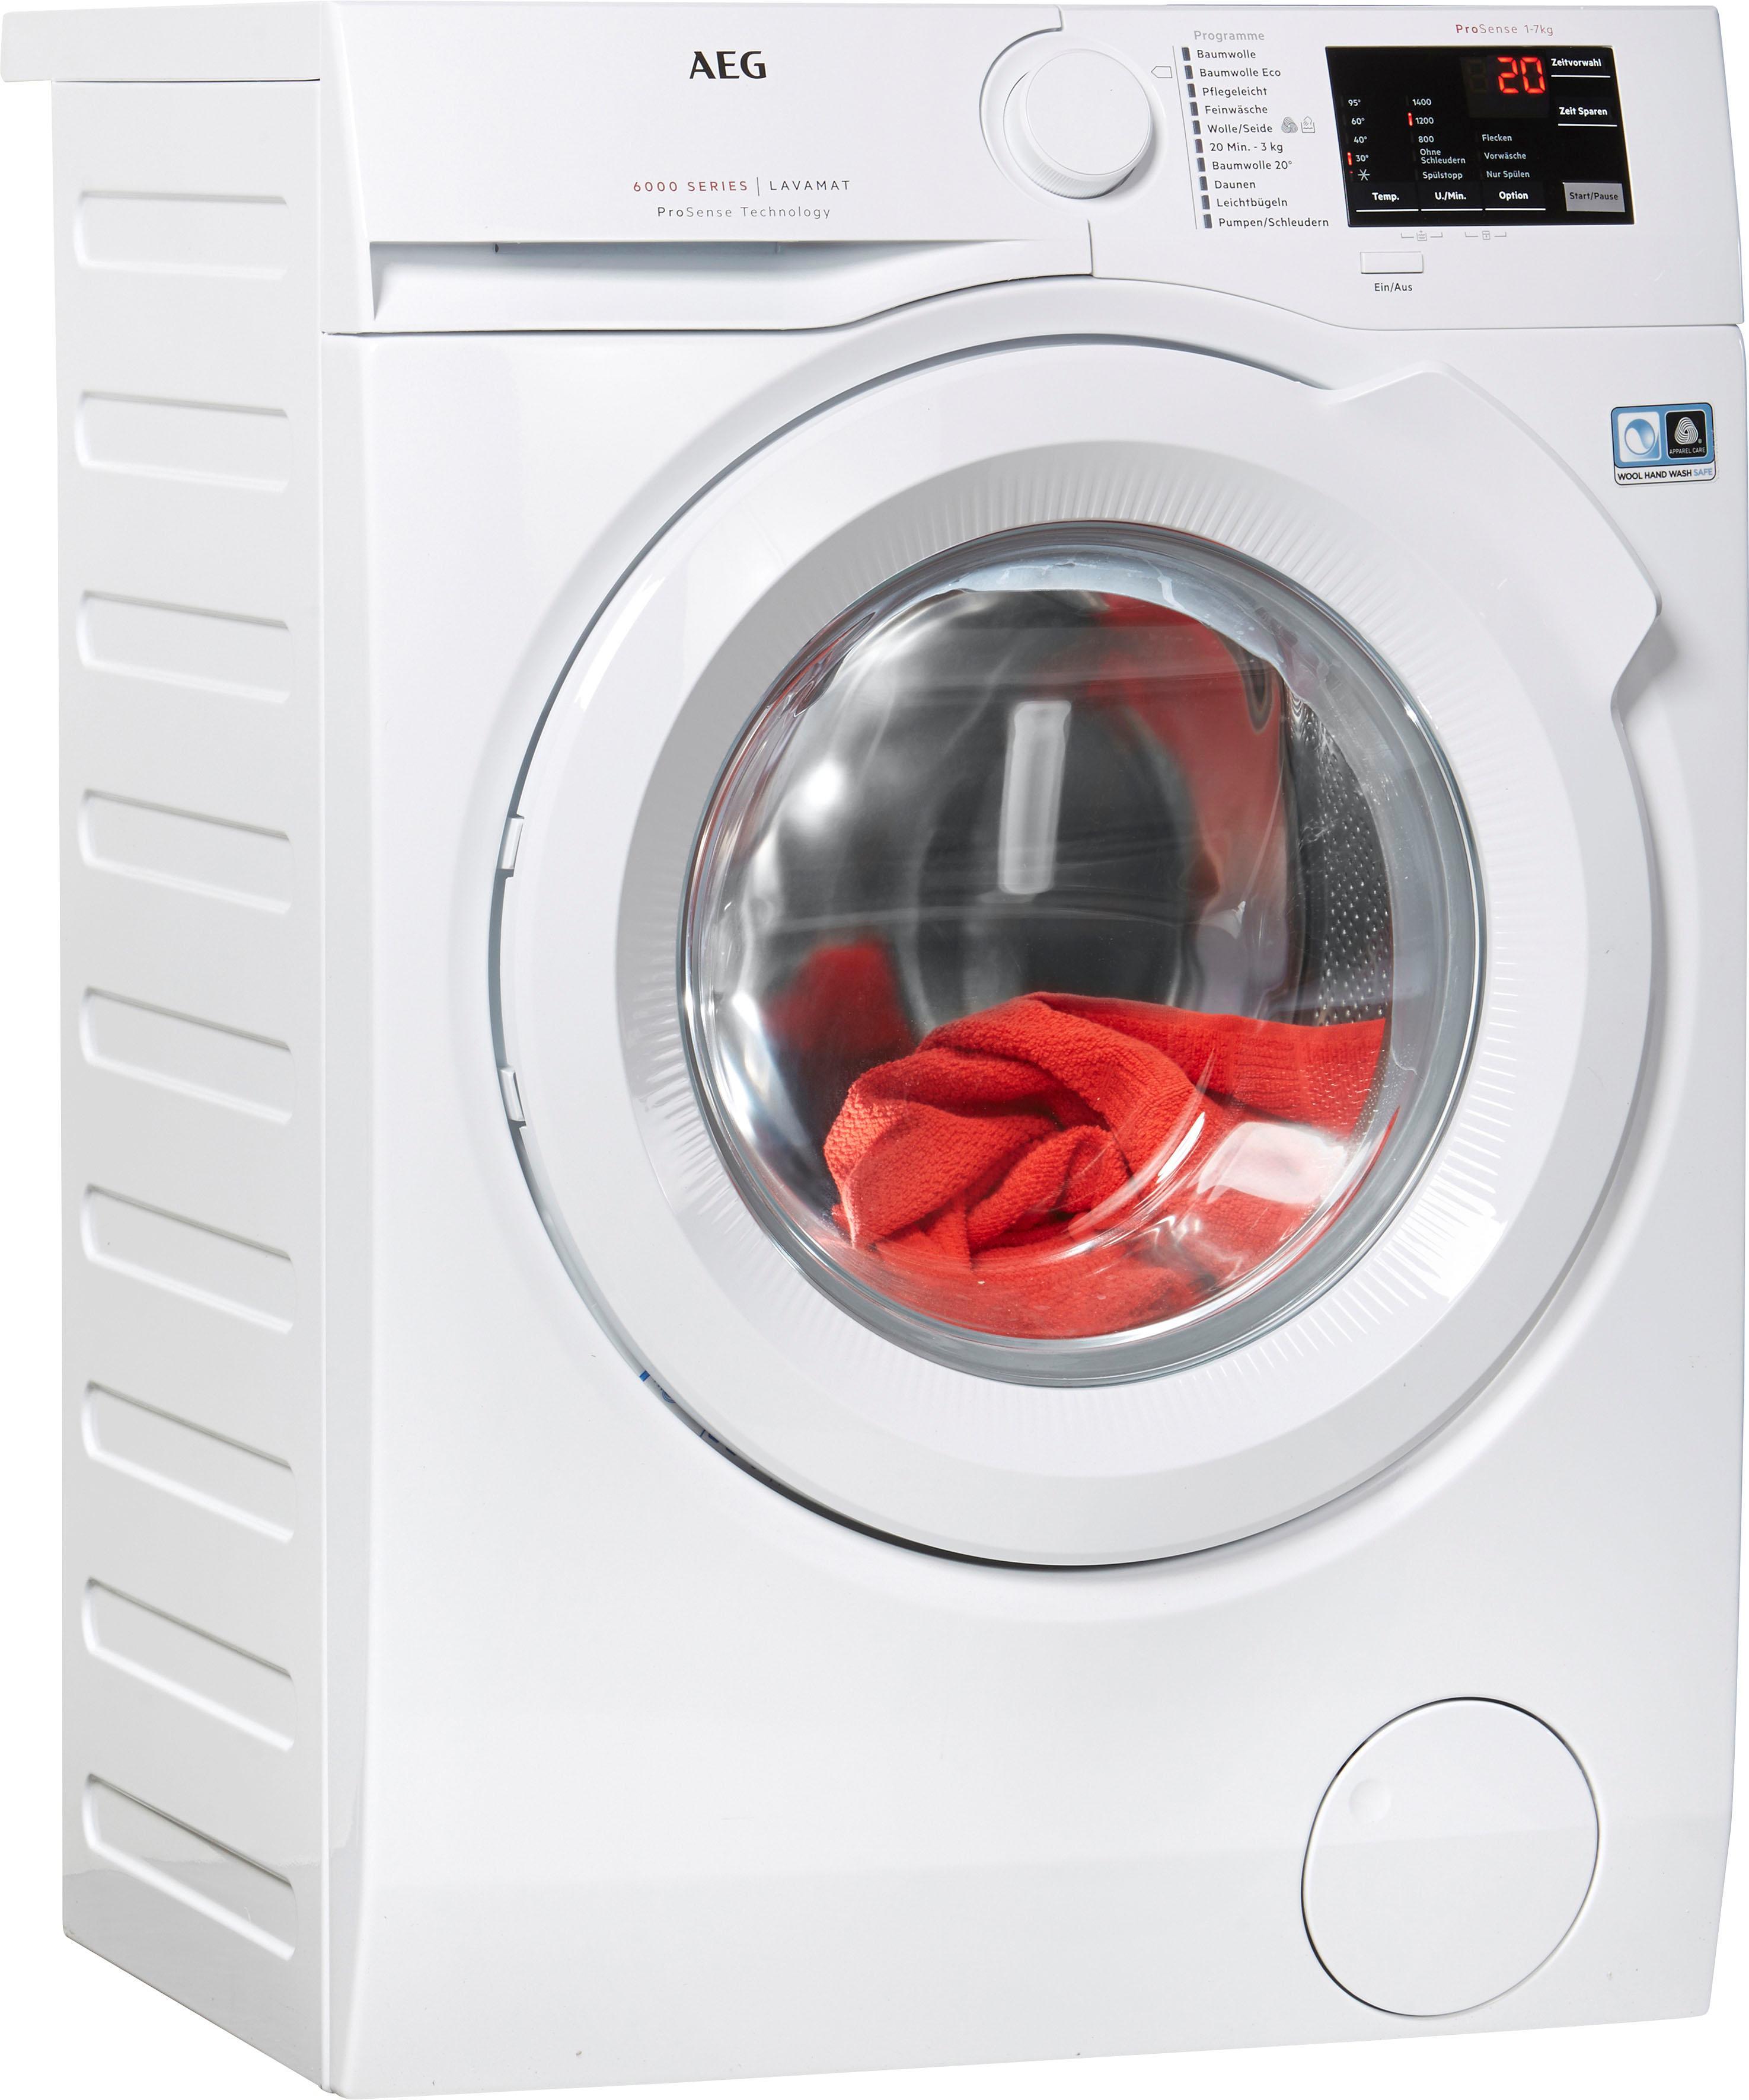 aeg waschmaschine lavamat l6fb54470 auf rechnung baur. Black Bedroom Furniture Sets. Home Design Ideas